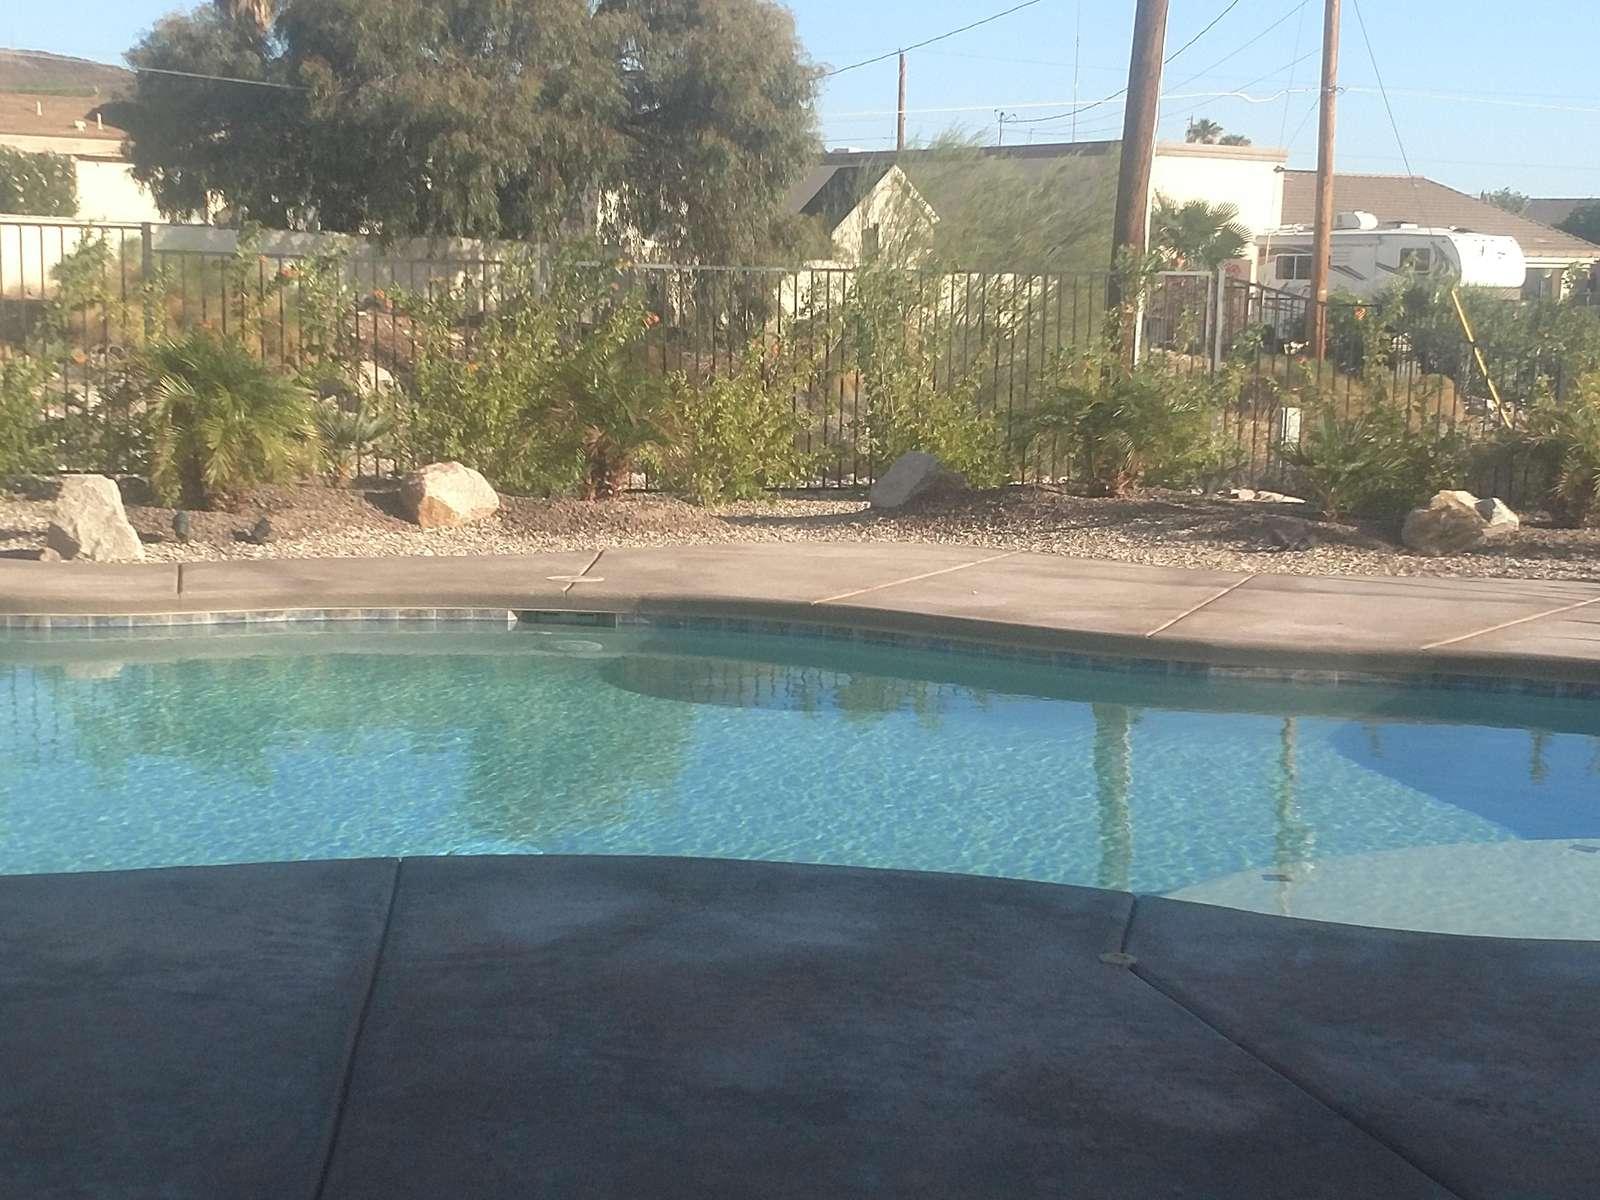 Gorgeous Gunite Pool and Spa